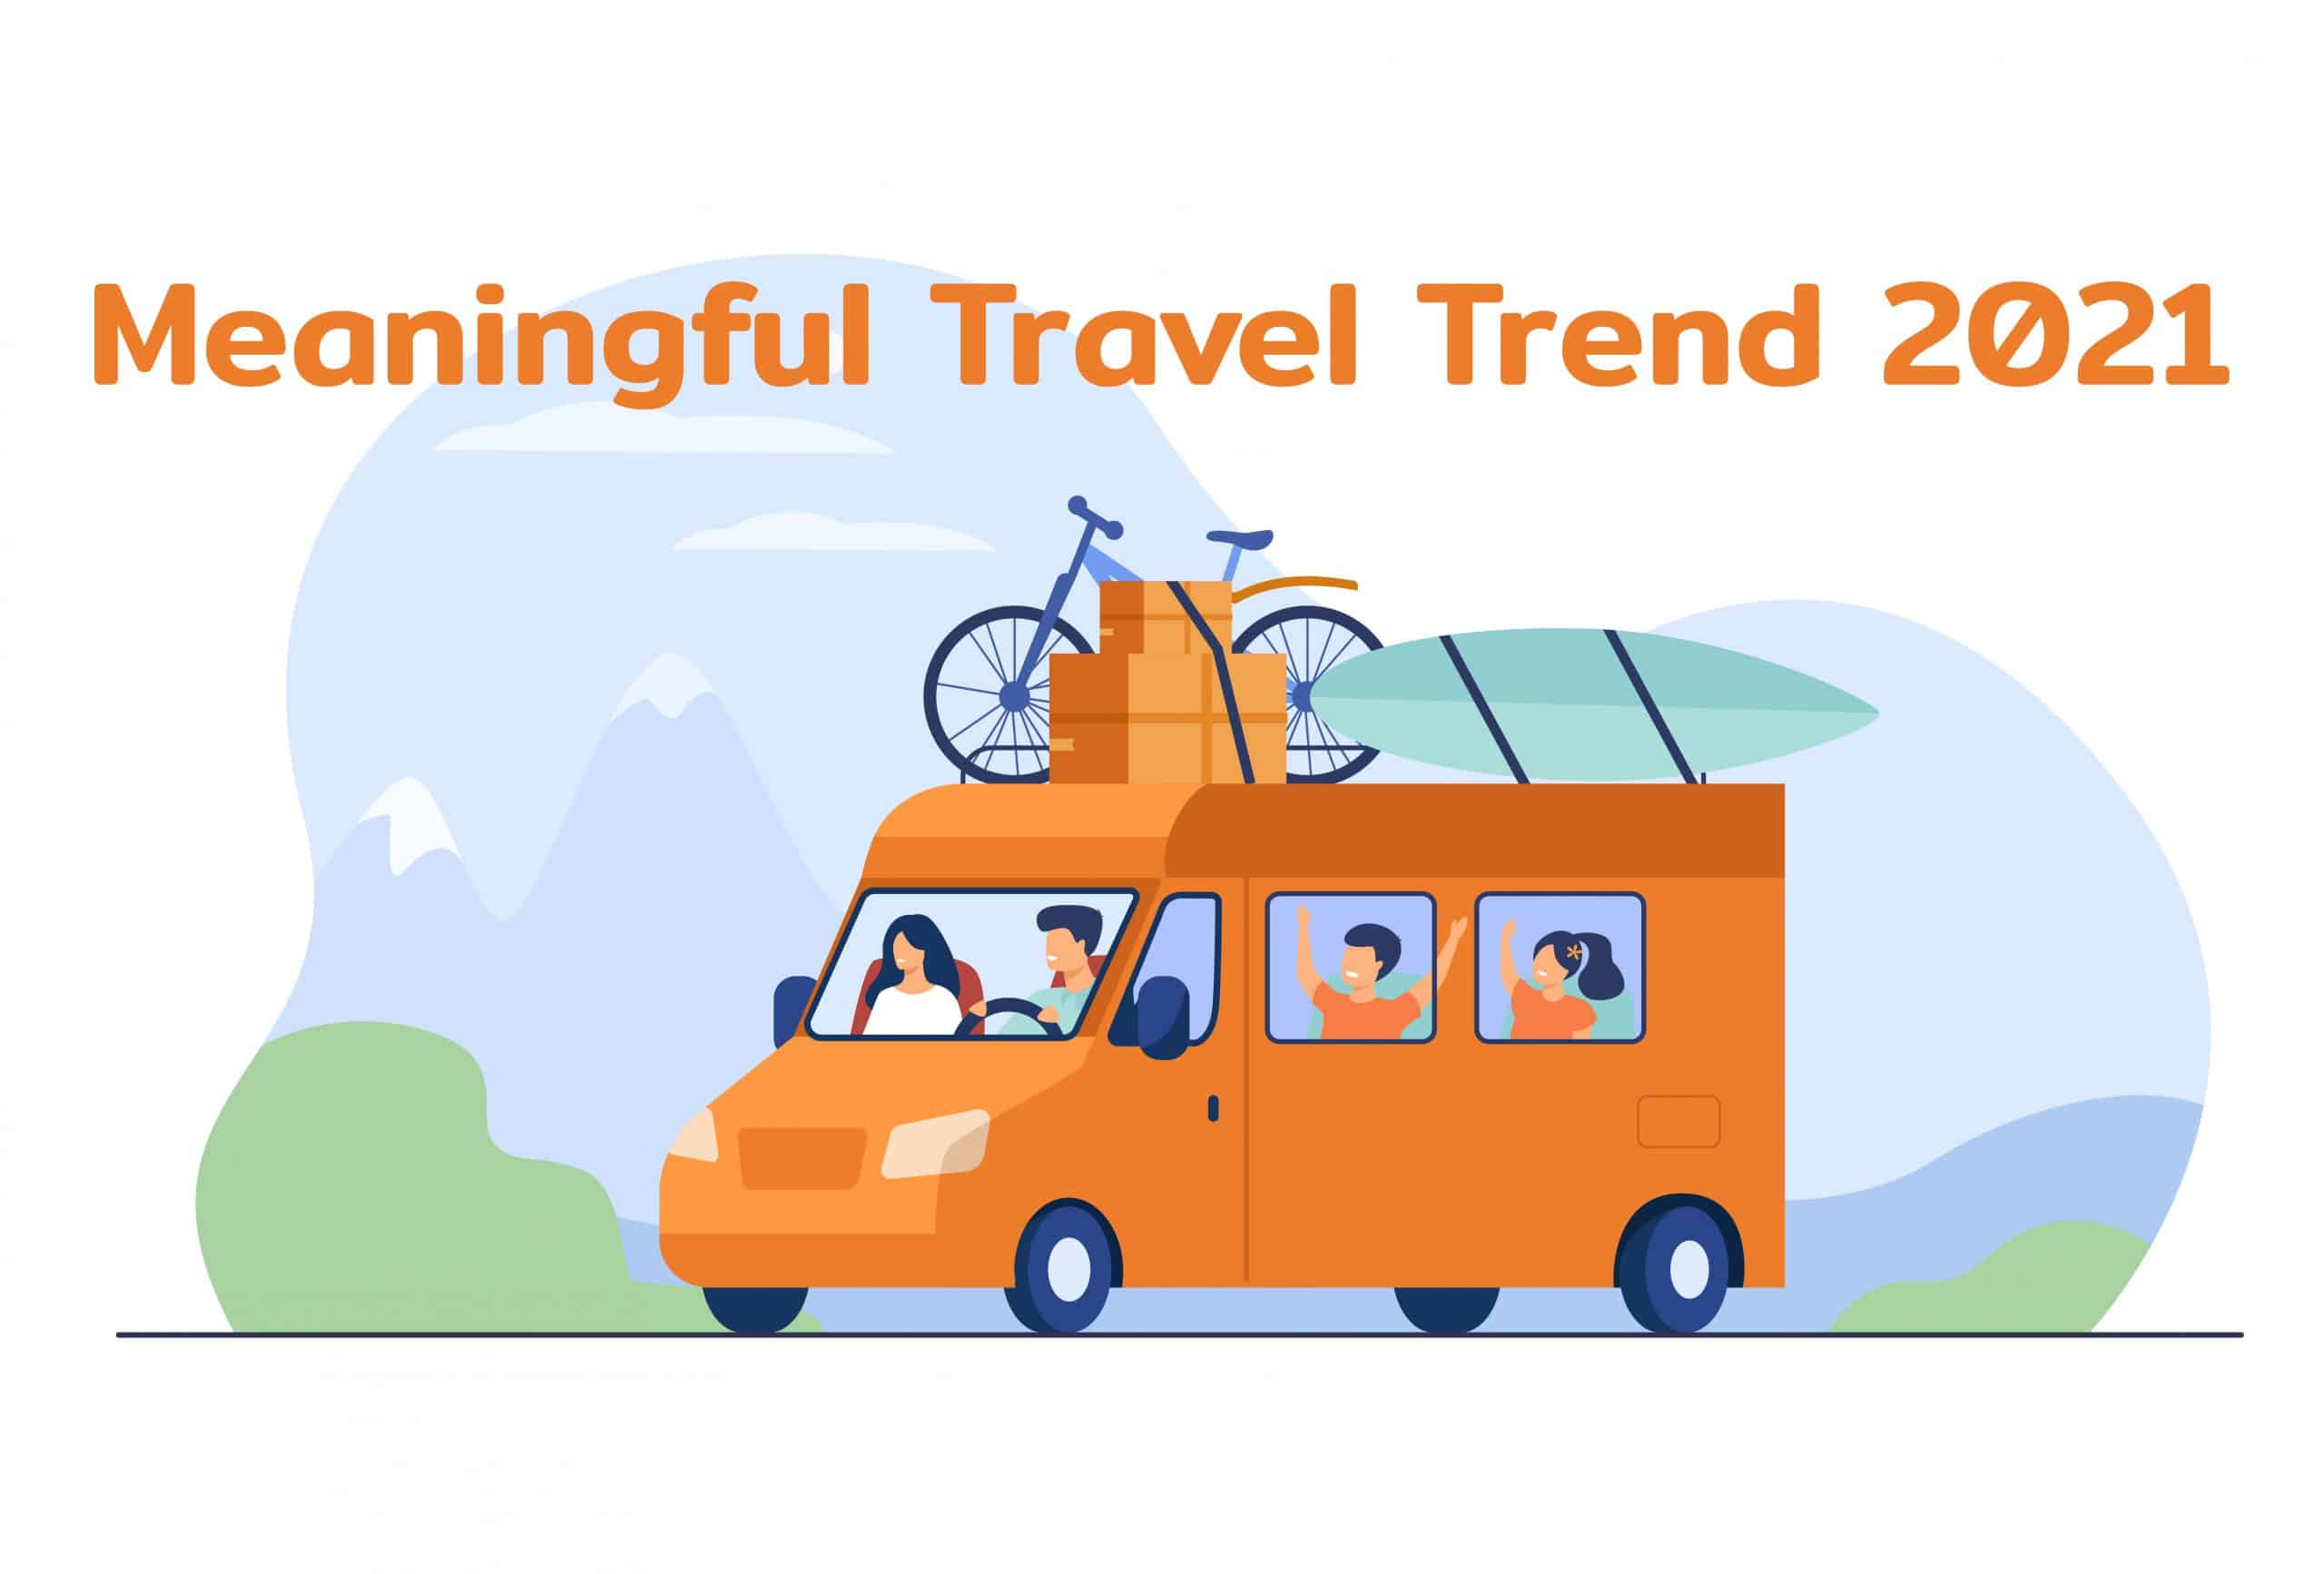 Meaningful Travel Trend 2021 เทรนด์การท่องเที่ยวคนไทย ไปกับครอบครัวและคนสนิทเท่านั้น